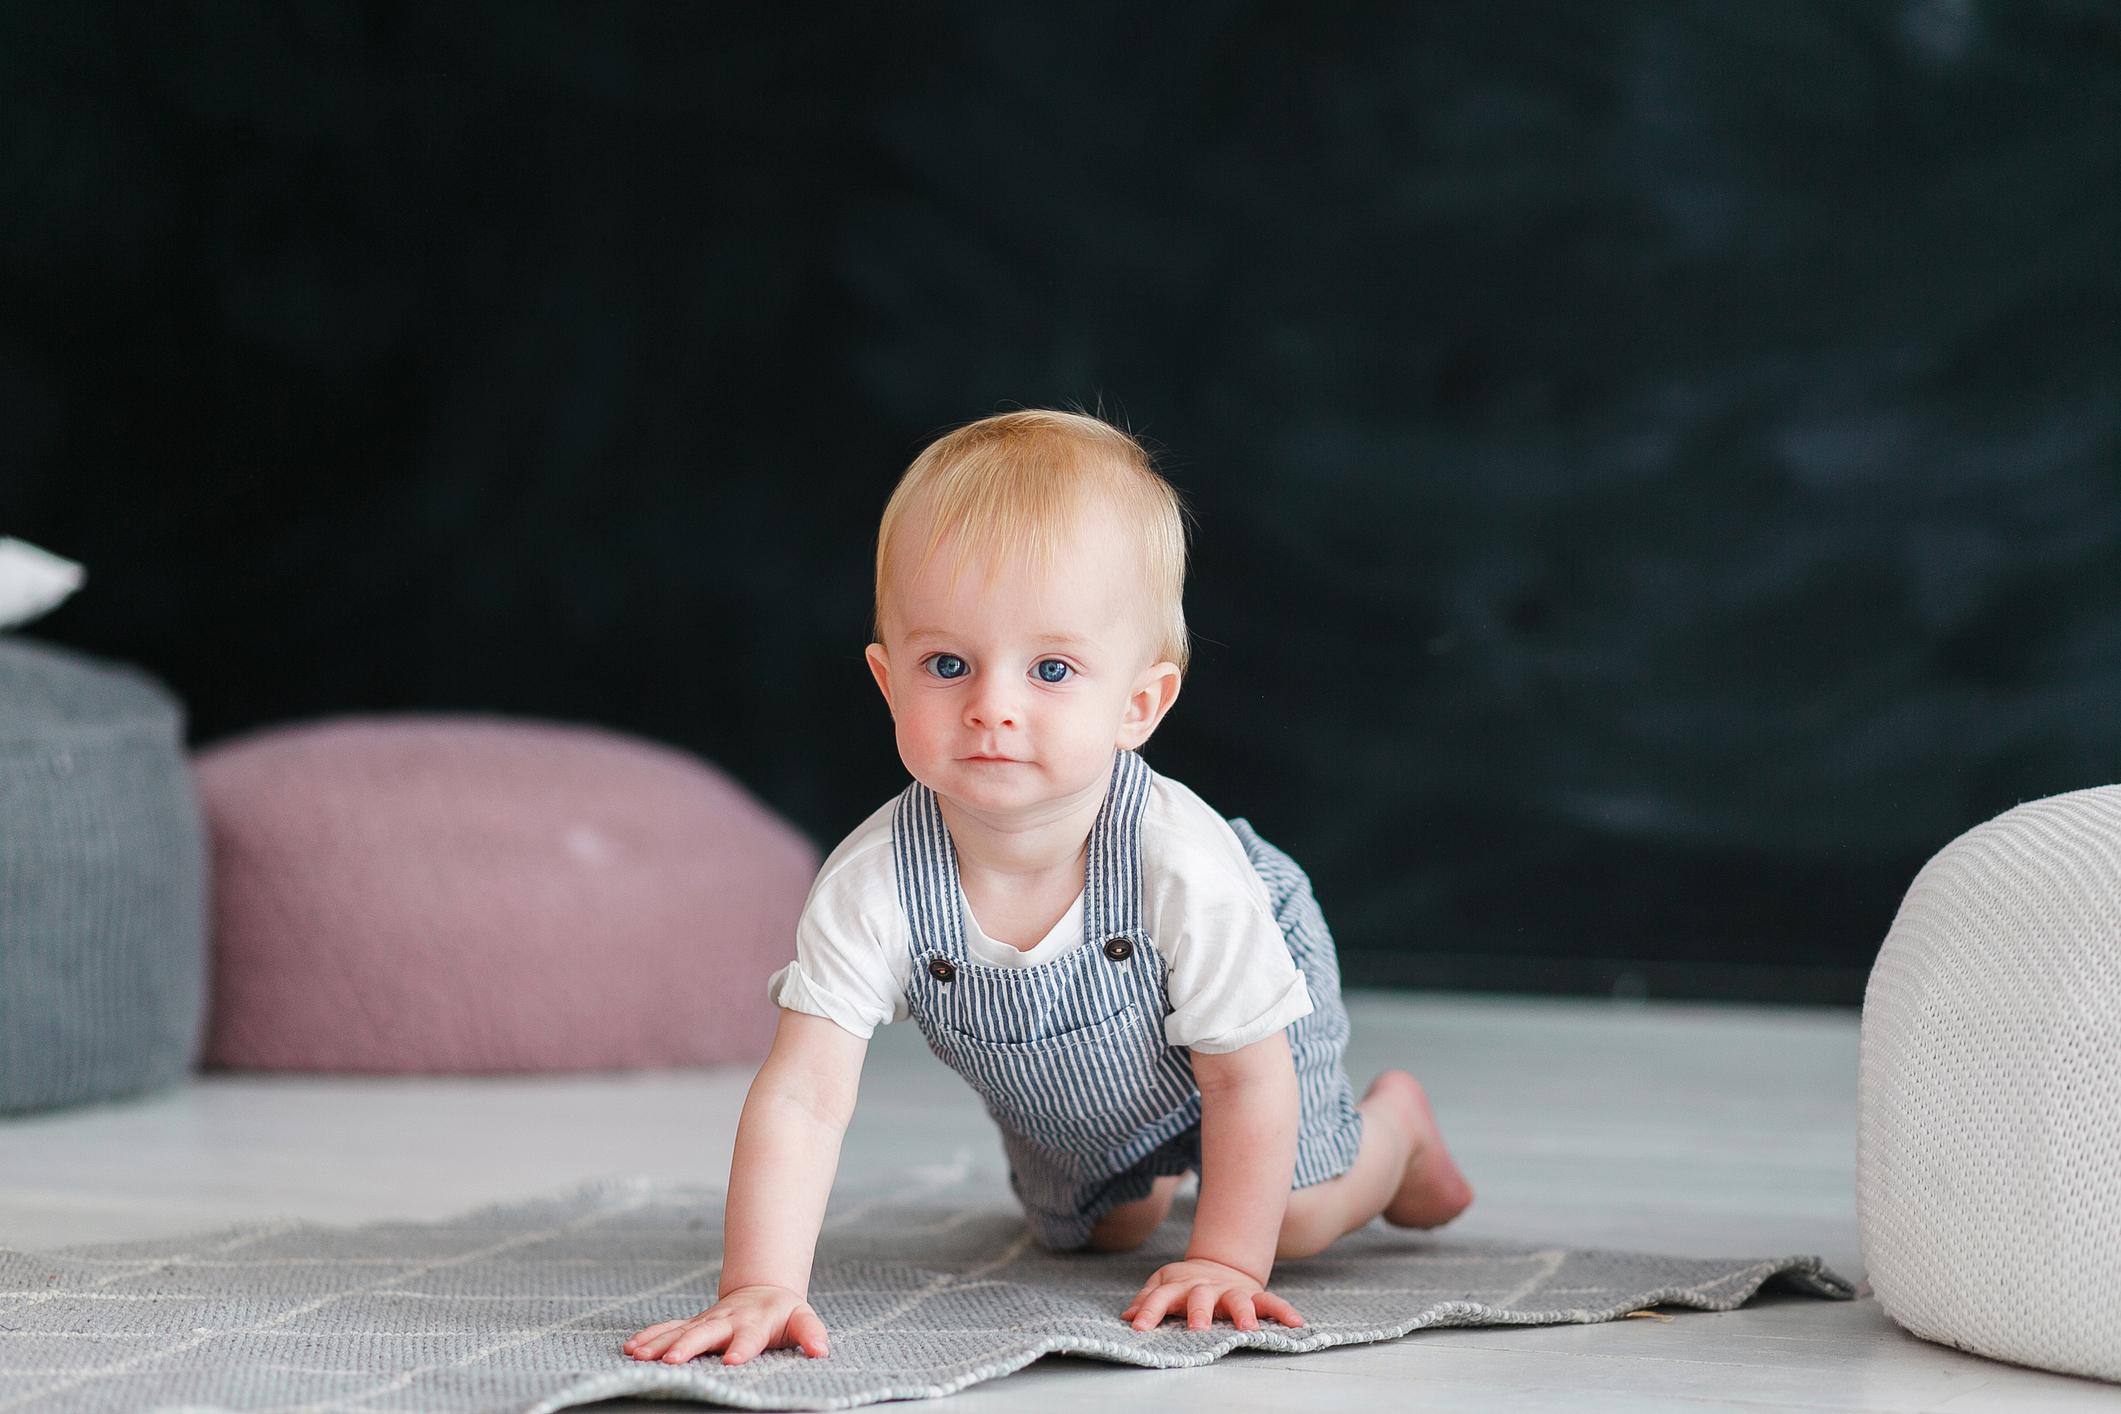 Little baby crawls on floor in black background.